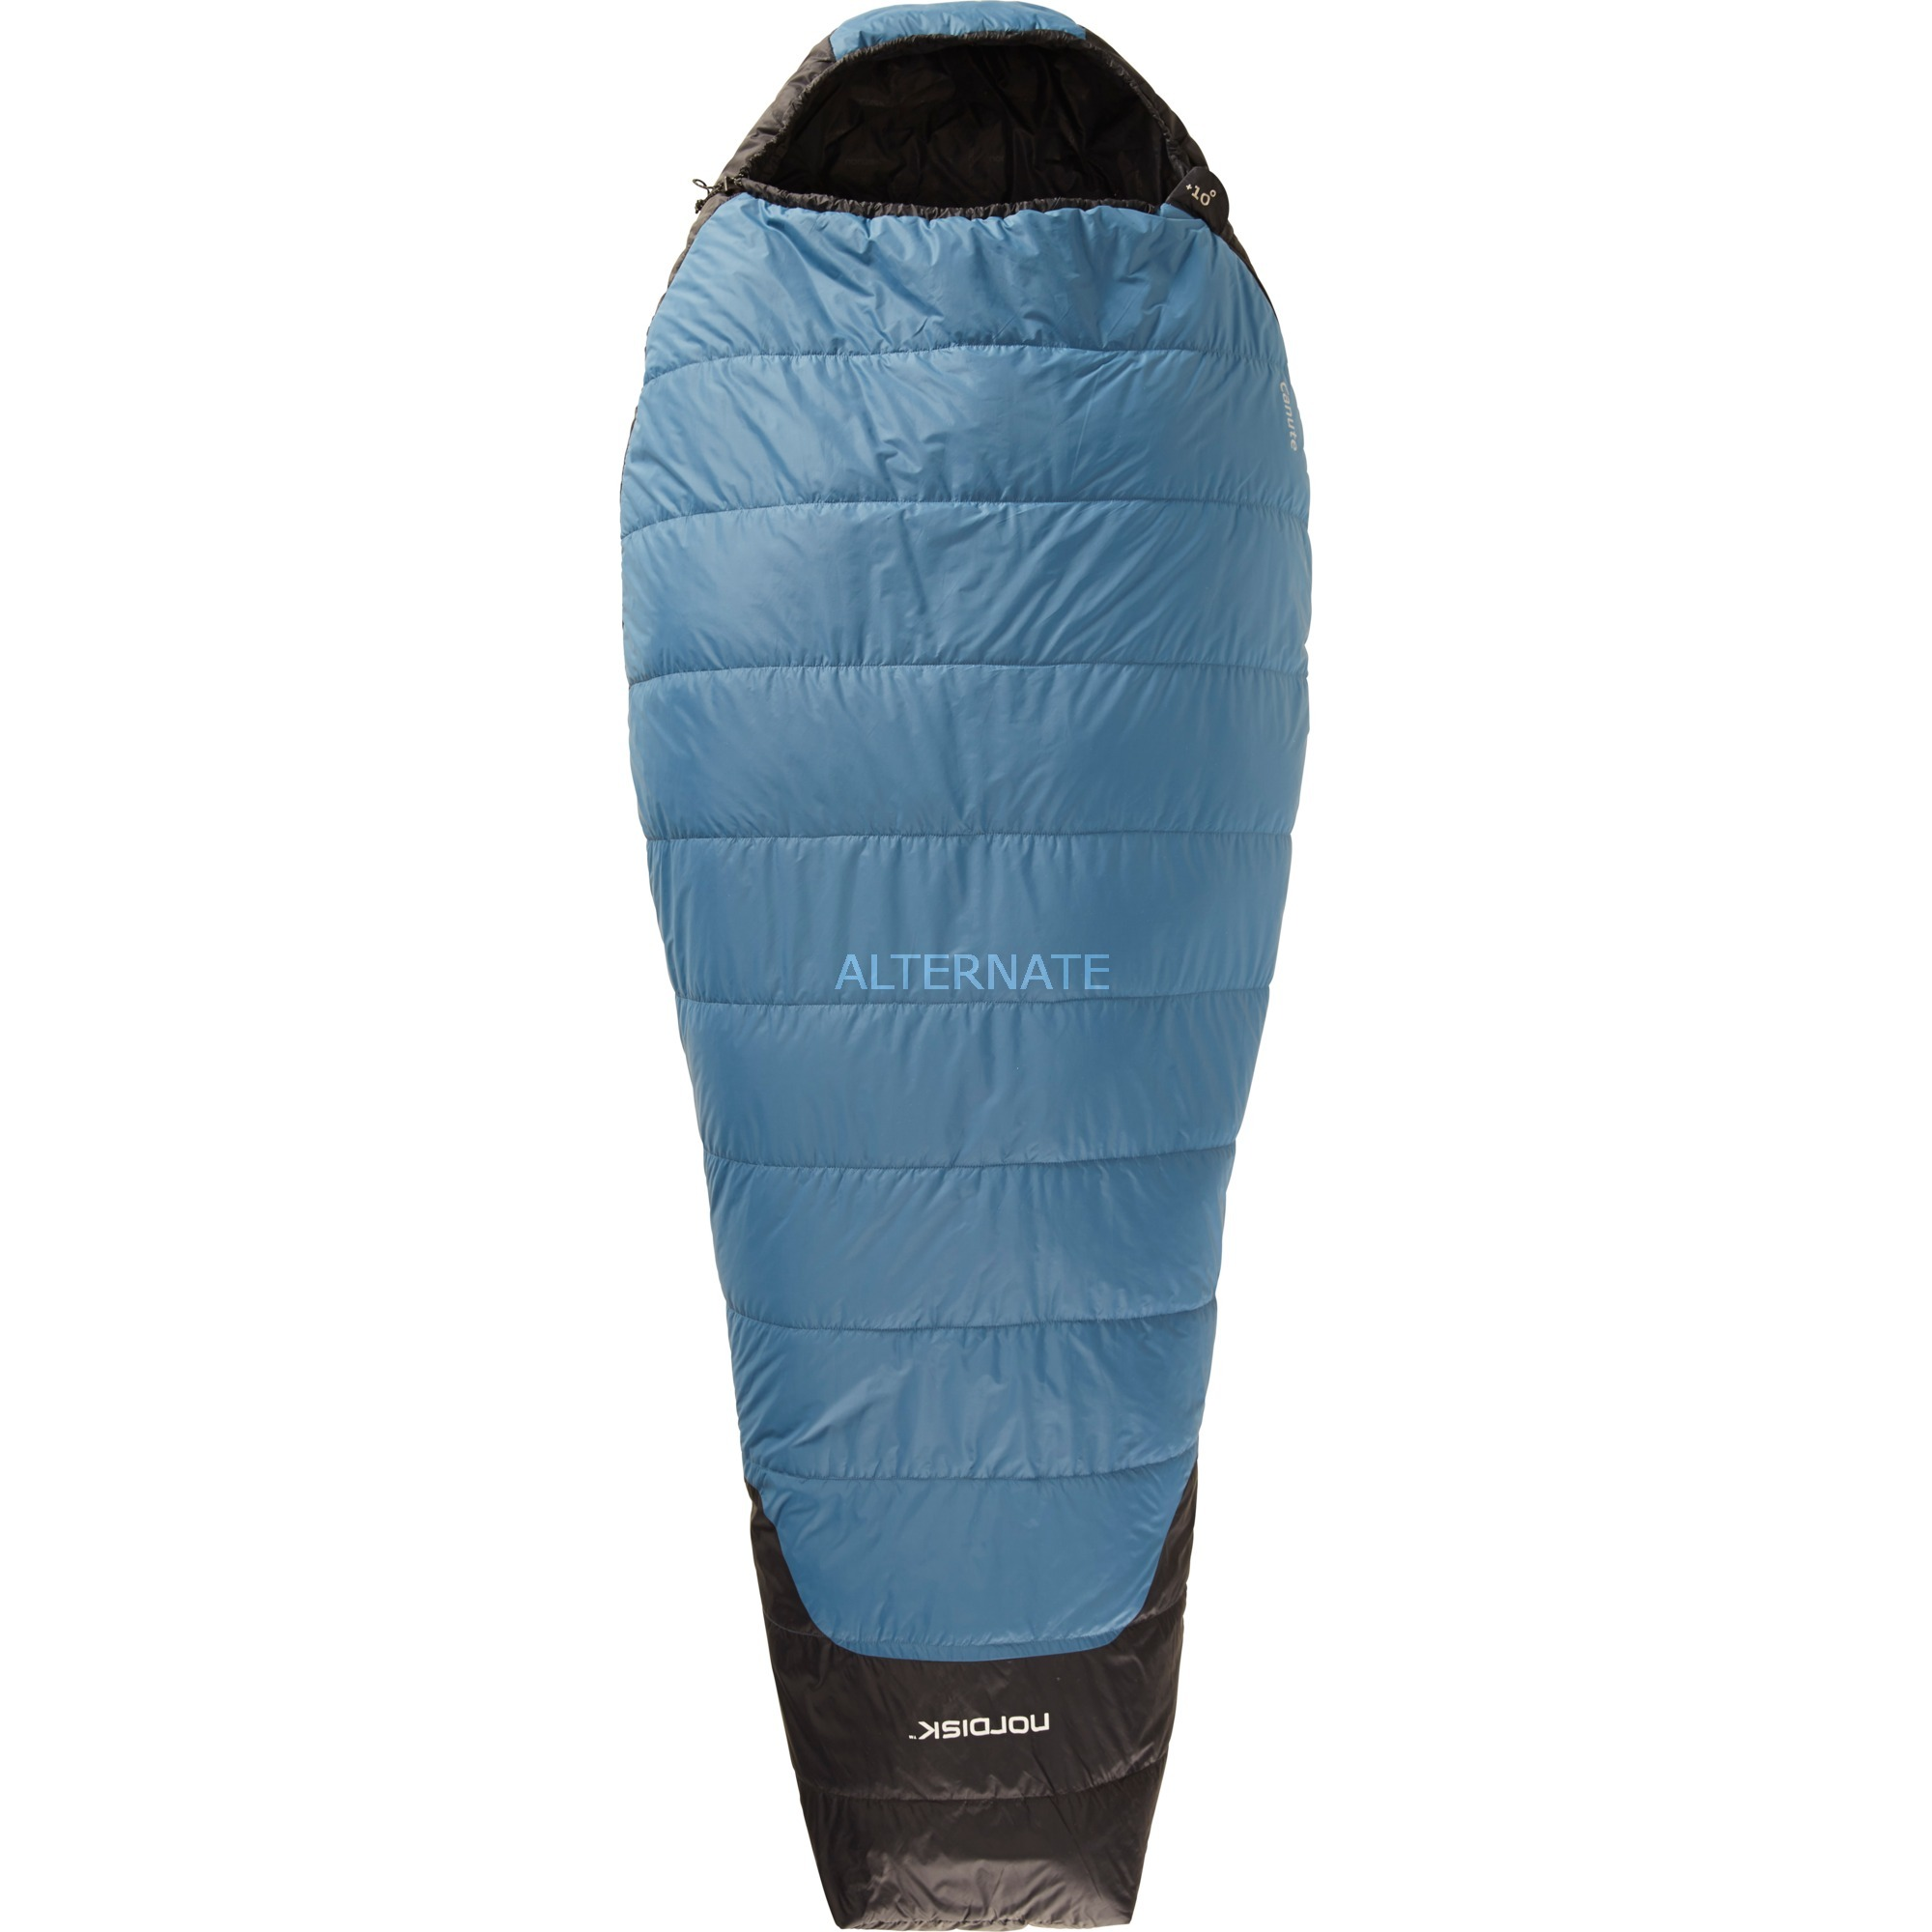 Canute +10° XL Sleeping Bag, Saco de dormir